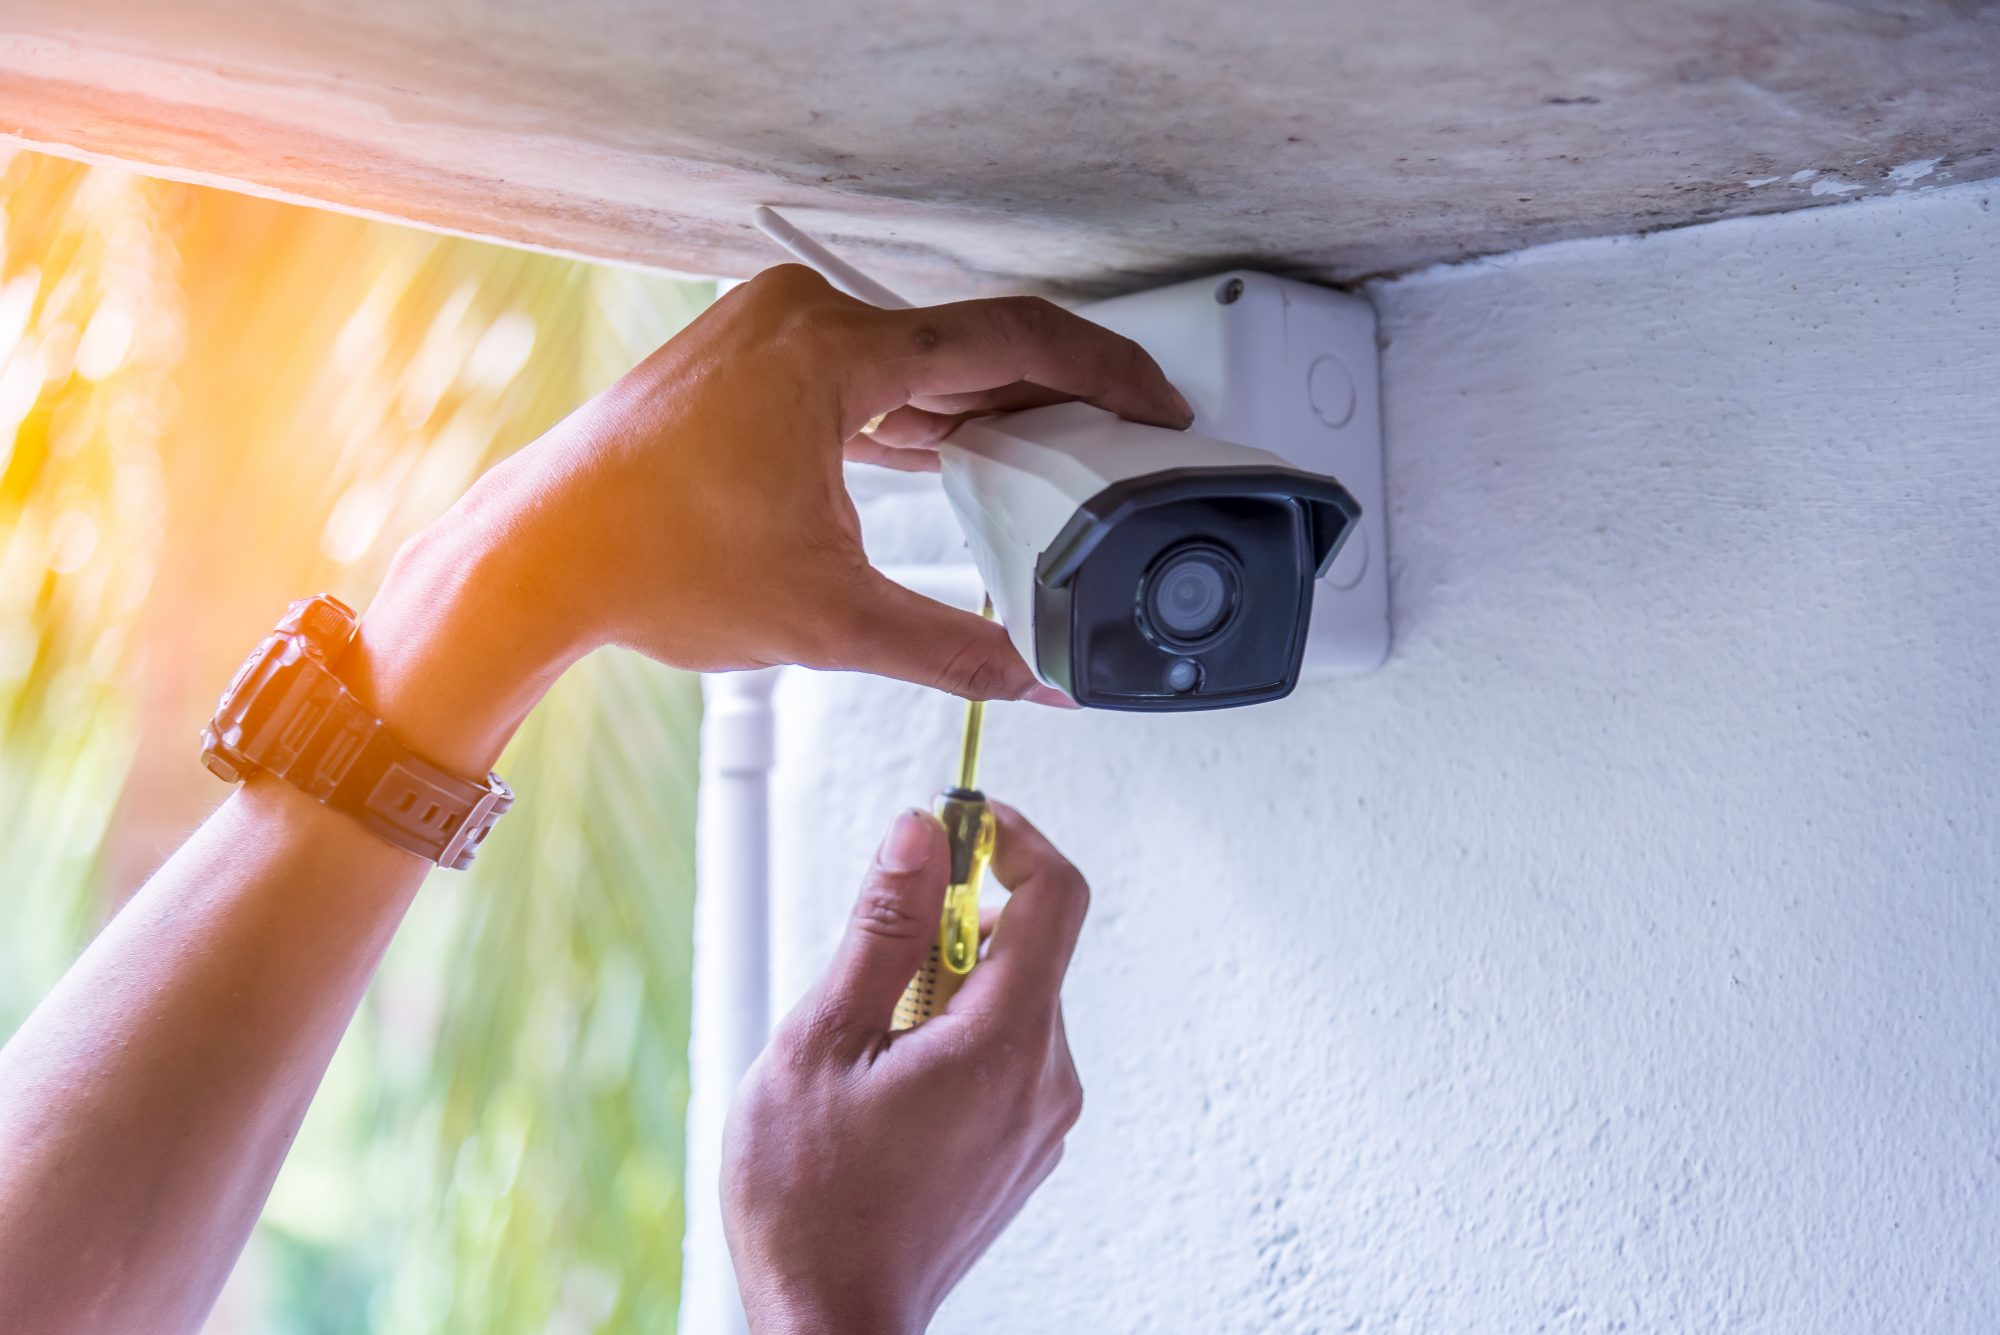 Brinks Home Security Customer Service